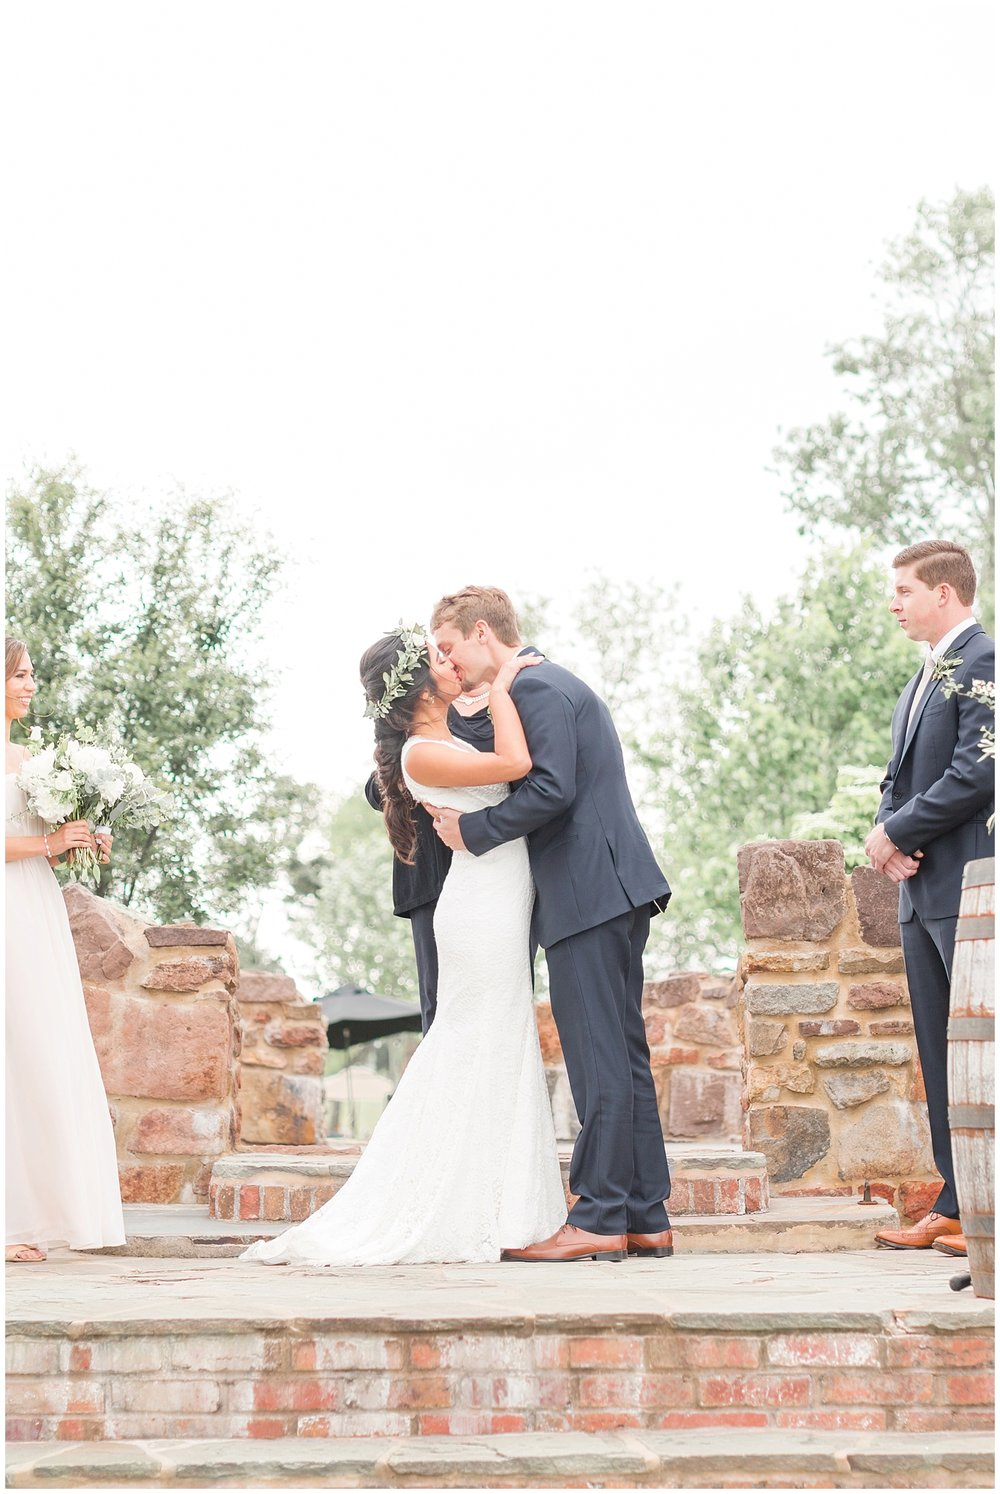 Manassas-Virginia-Wedding-Photos_Winery-at-Bull-Run-Wedding_Jessica-Green-Photography-43.jpg